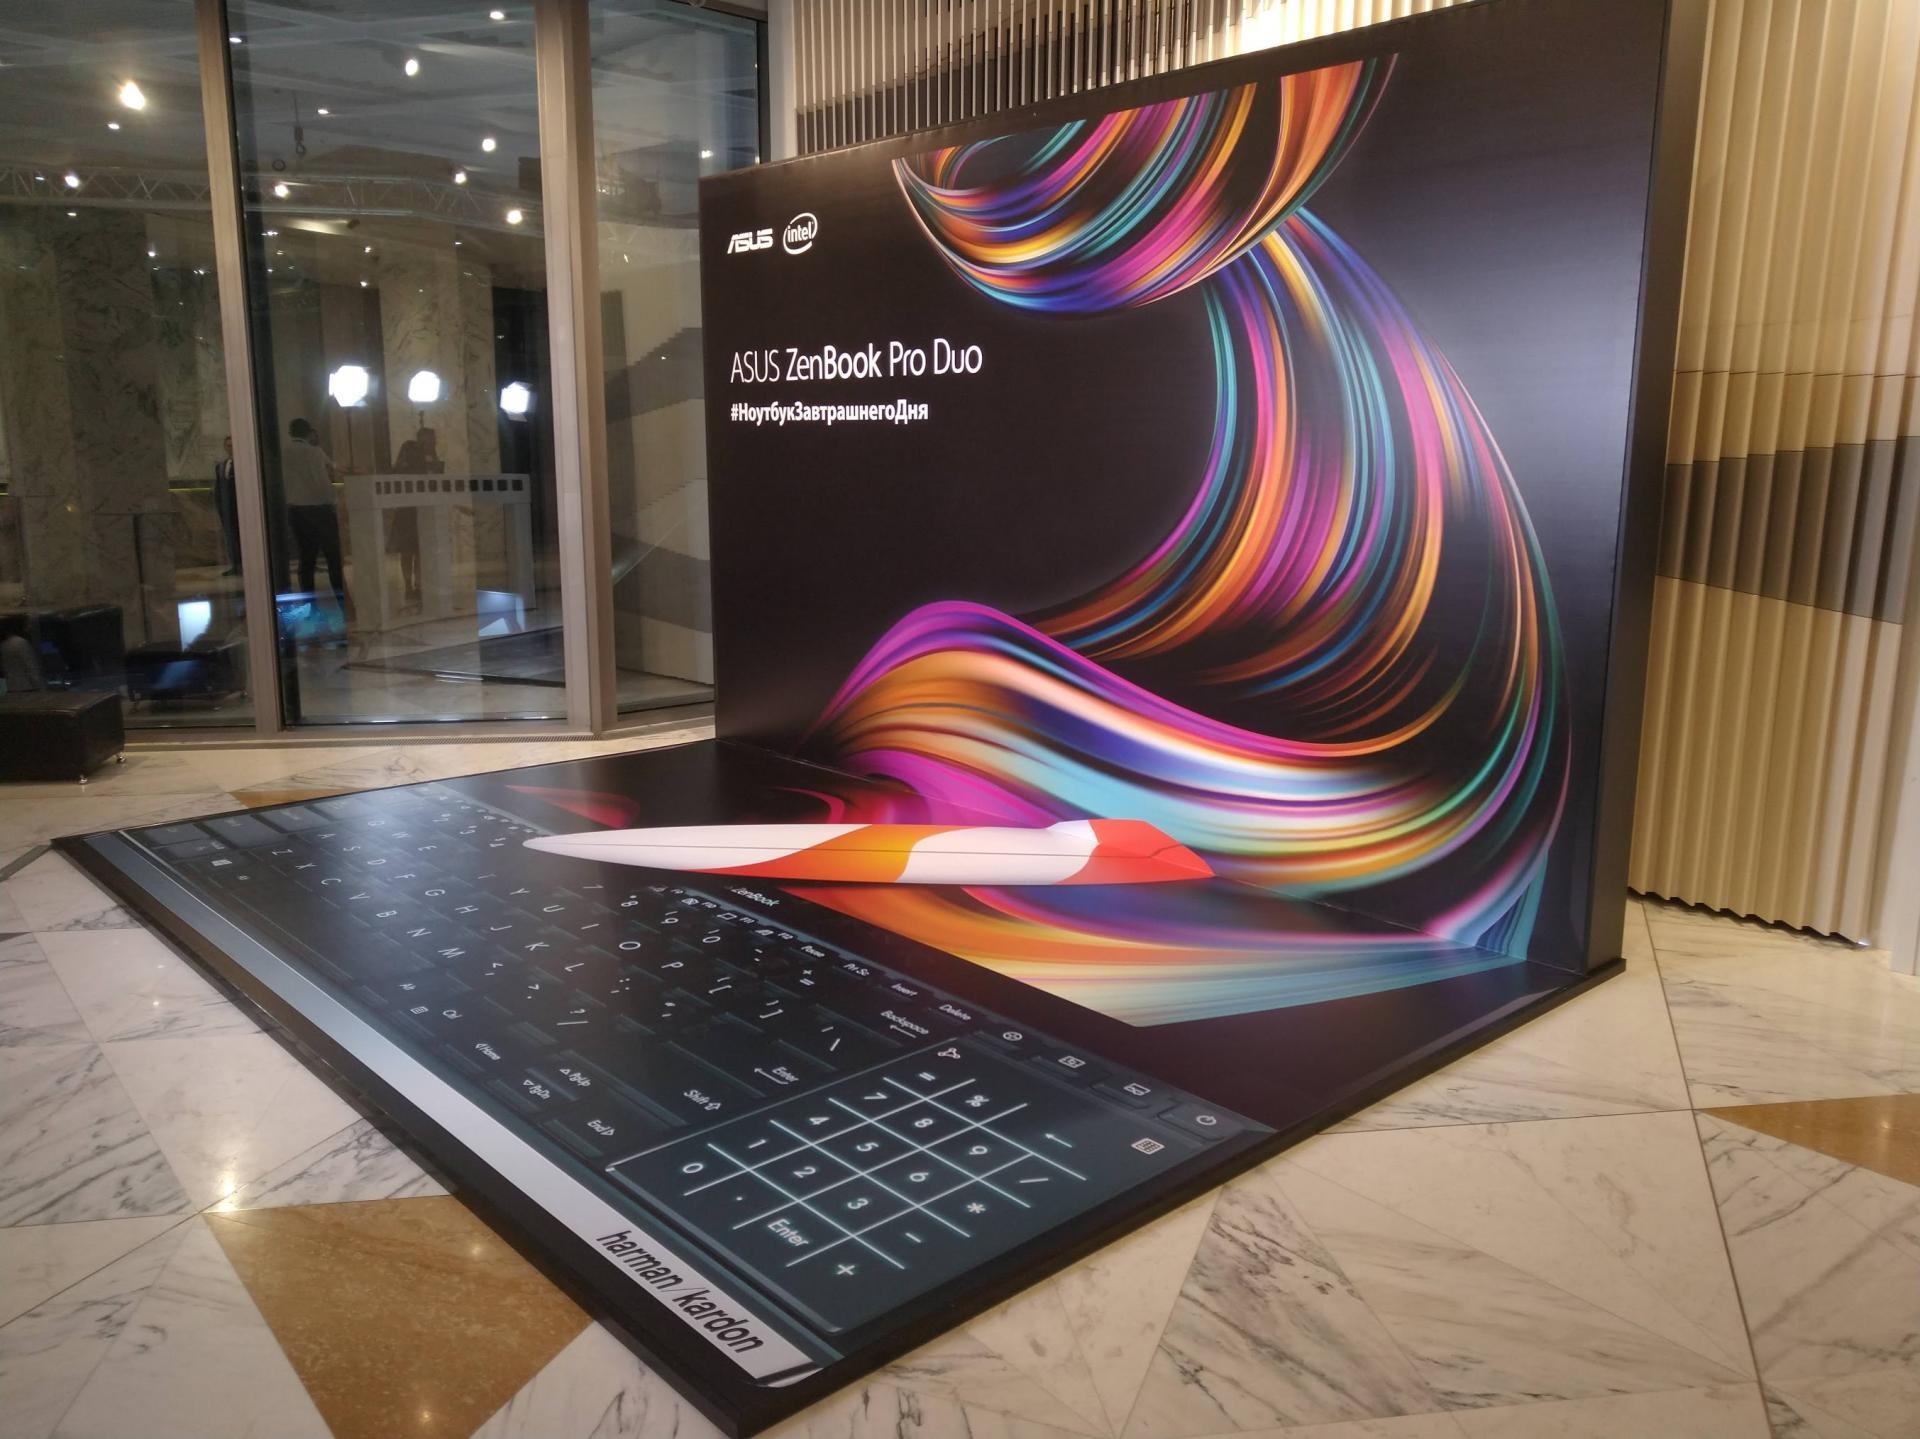 Asus объявила опоступлении впродажу ноутбуков ZenBook Pro Duo (UX581), Zenbook 13, 14, 15